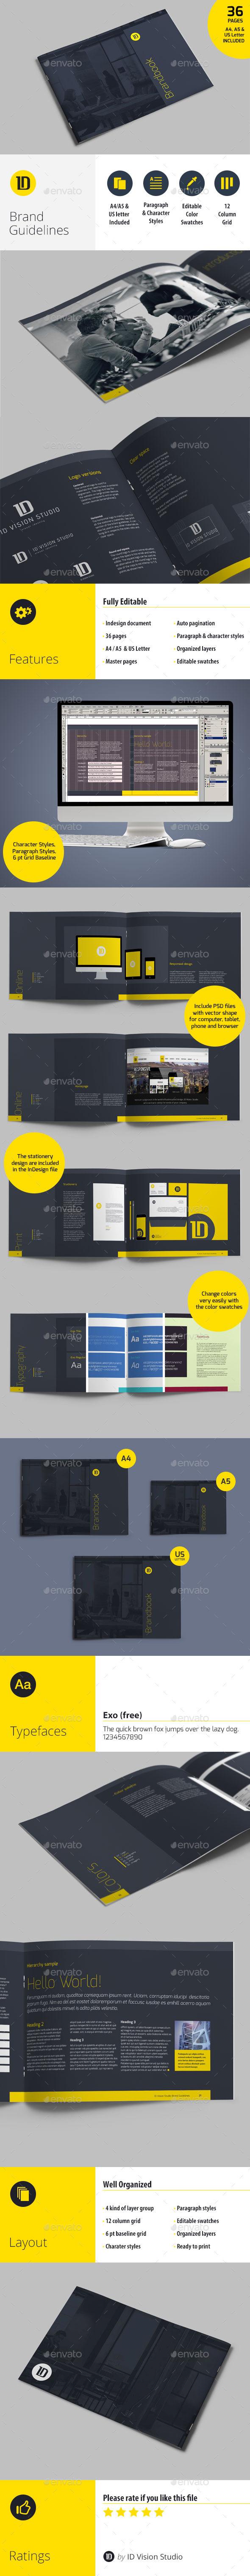 BrandBook Brand Guidelines Template